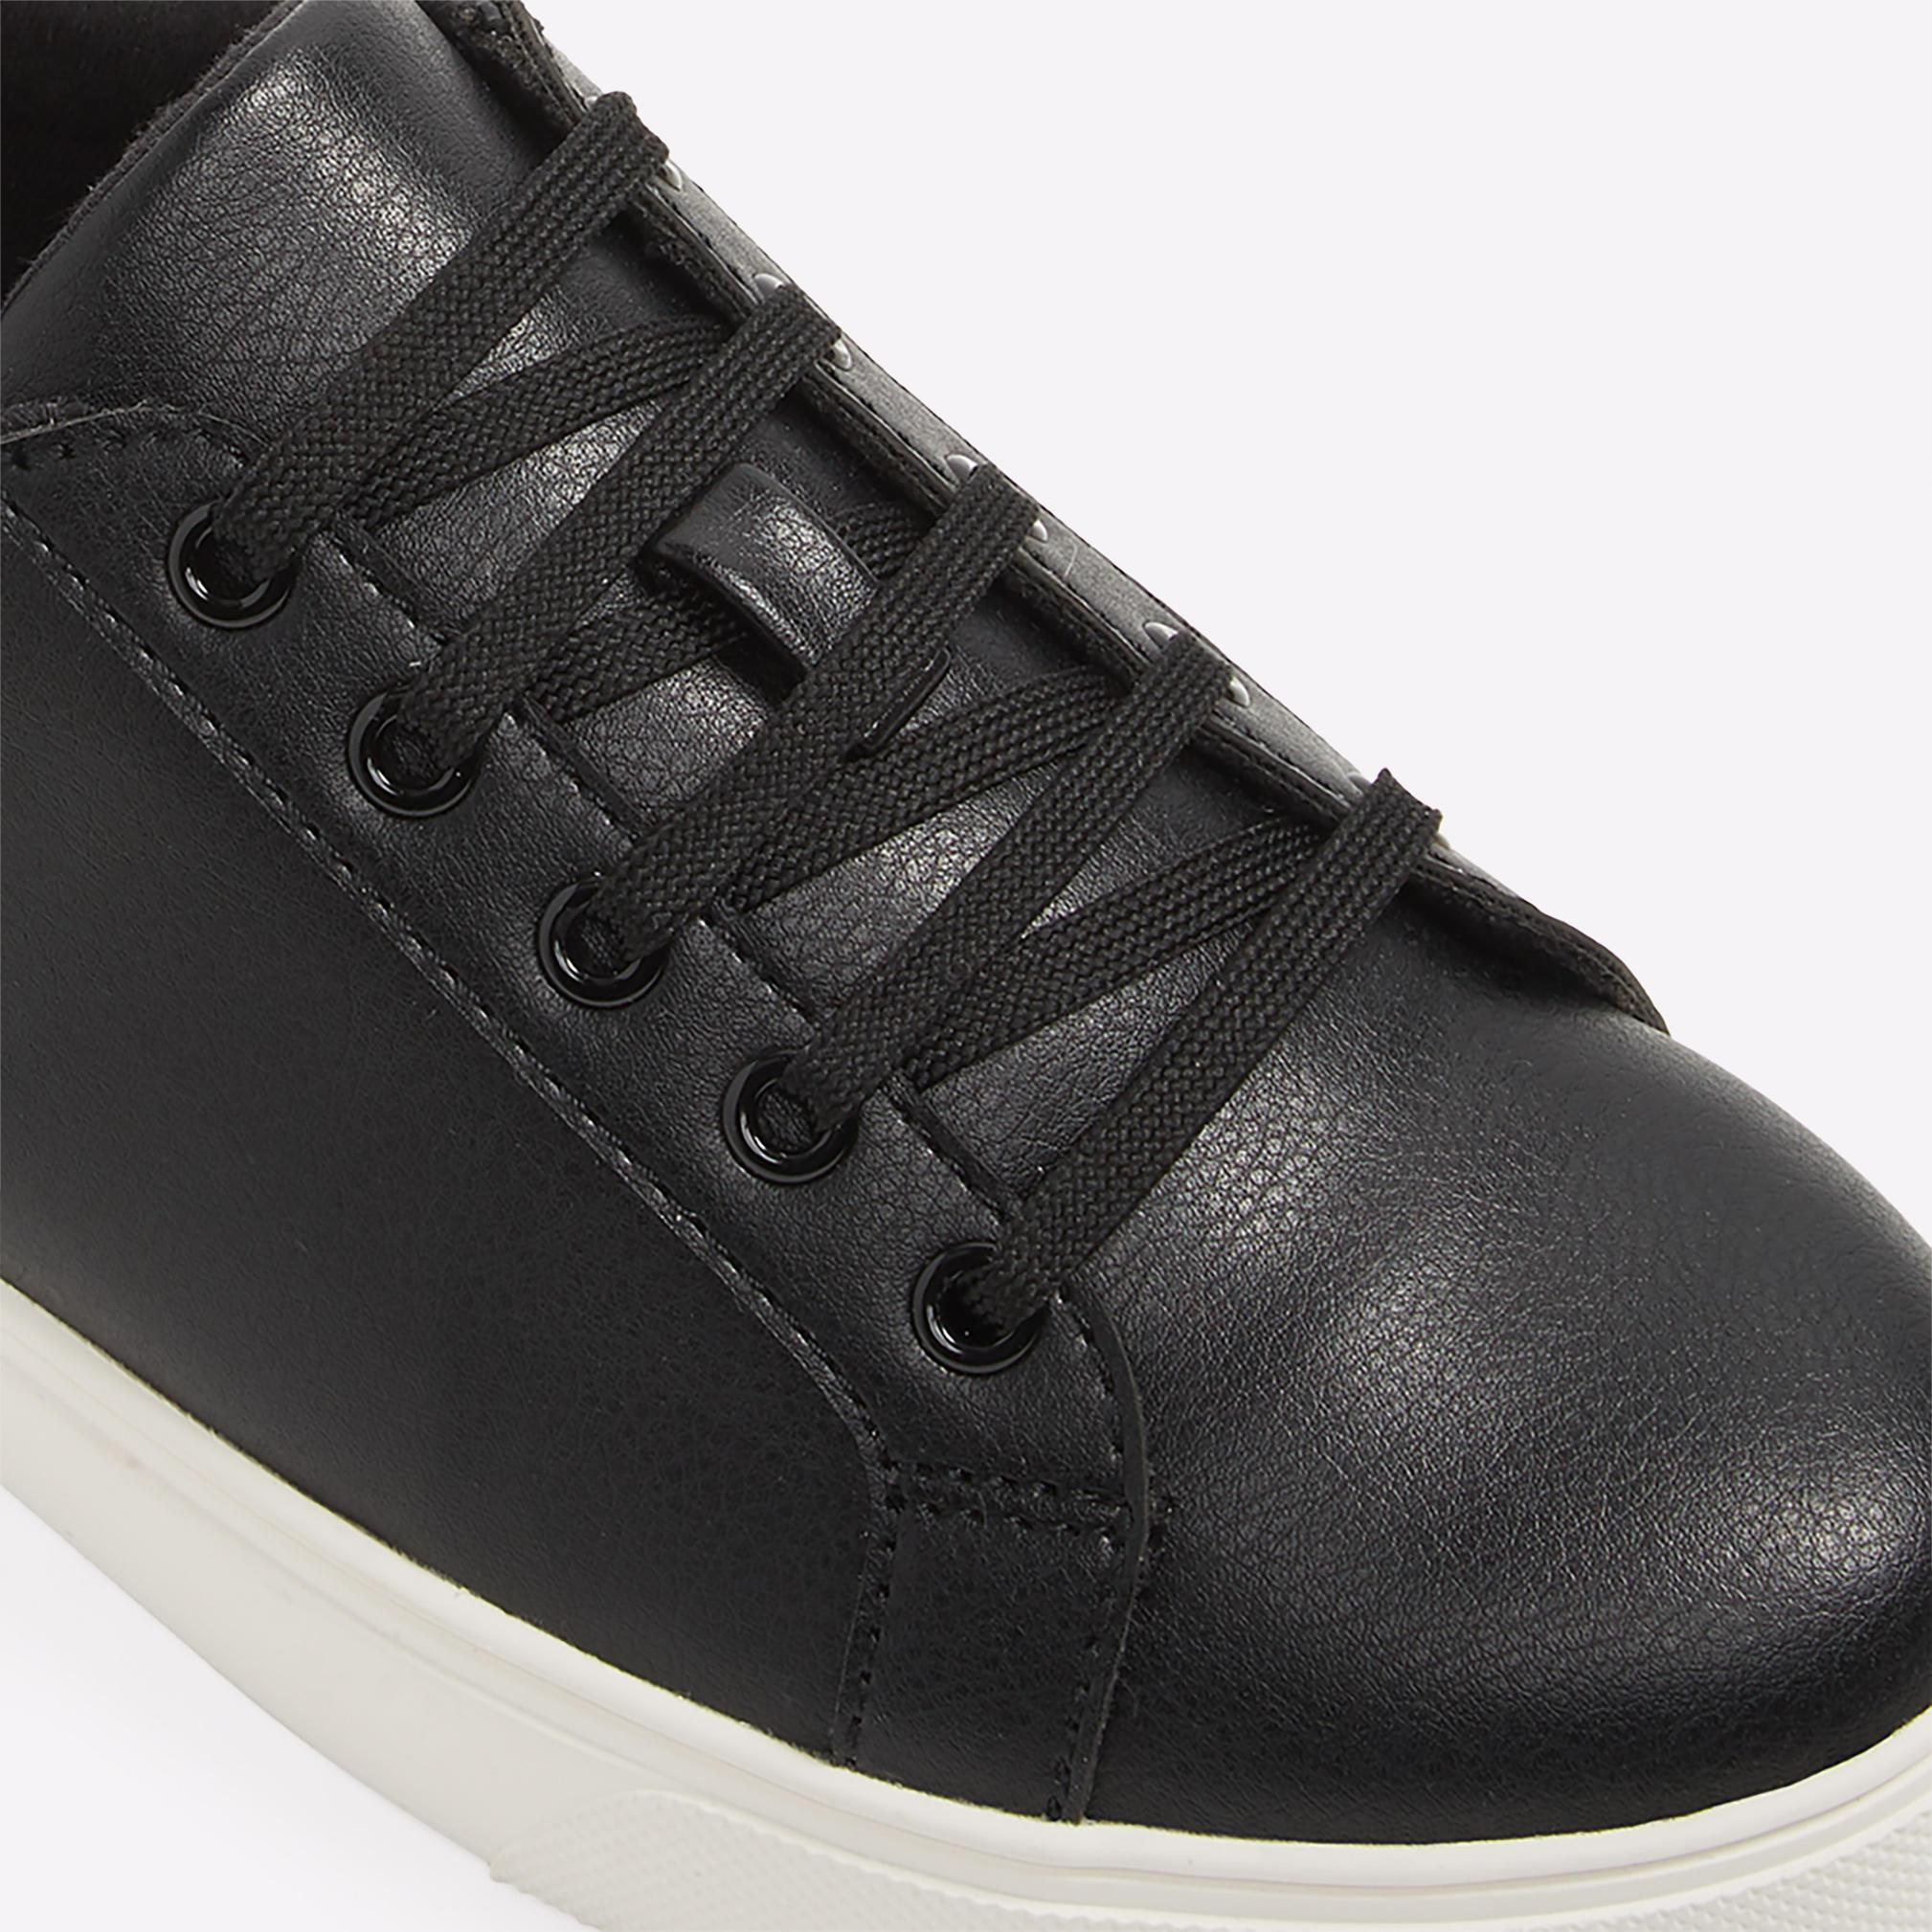 498b9f69f50db ALDO Black Brallan